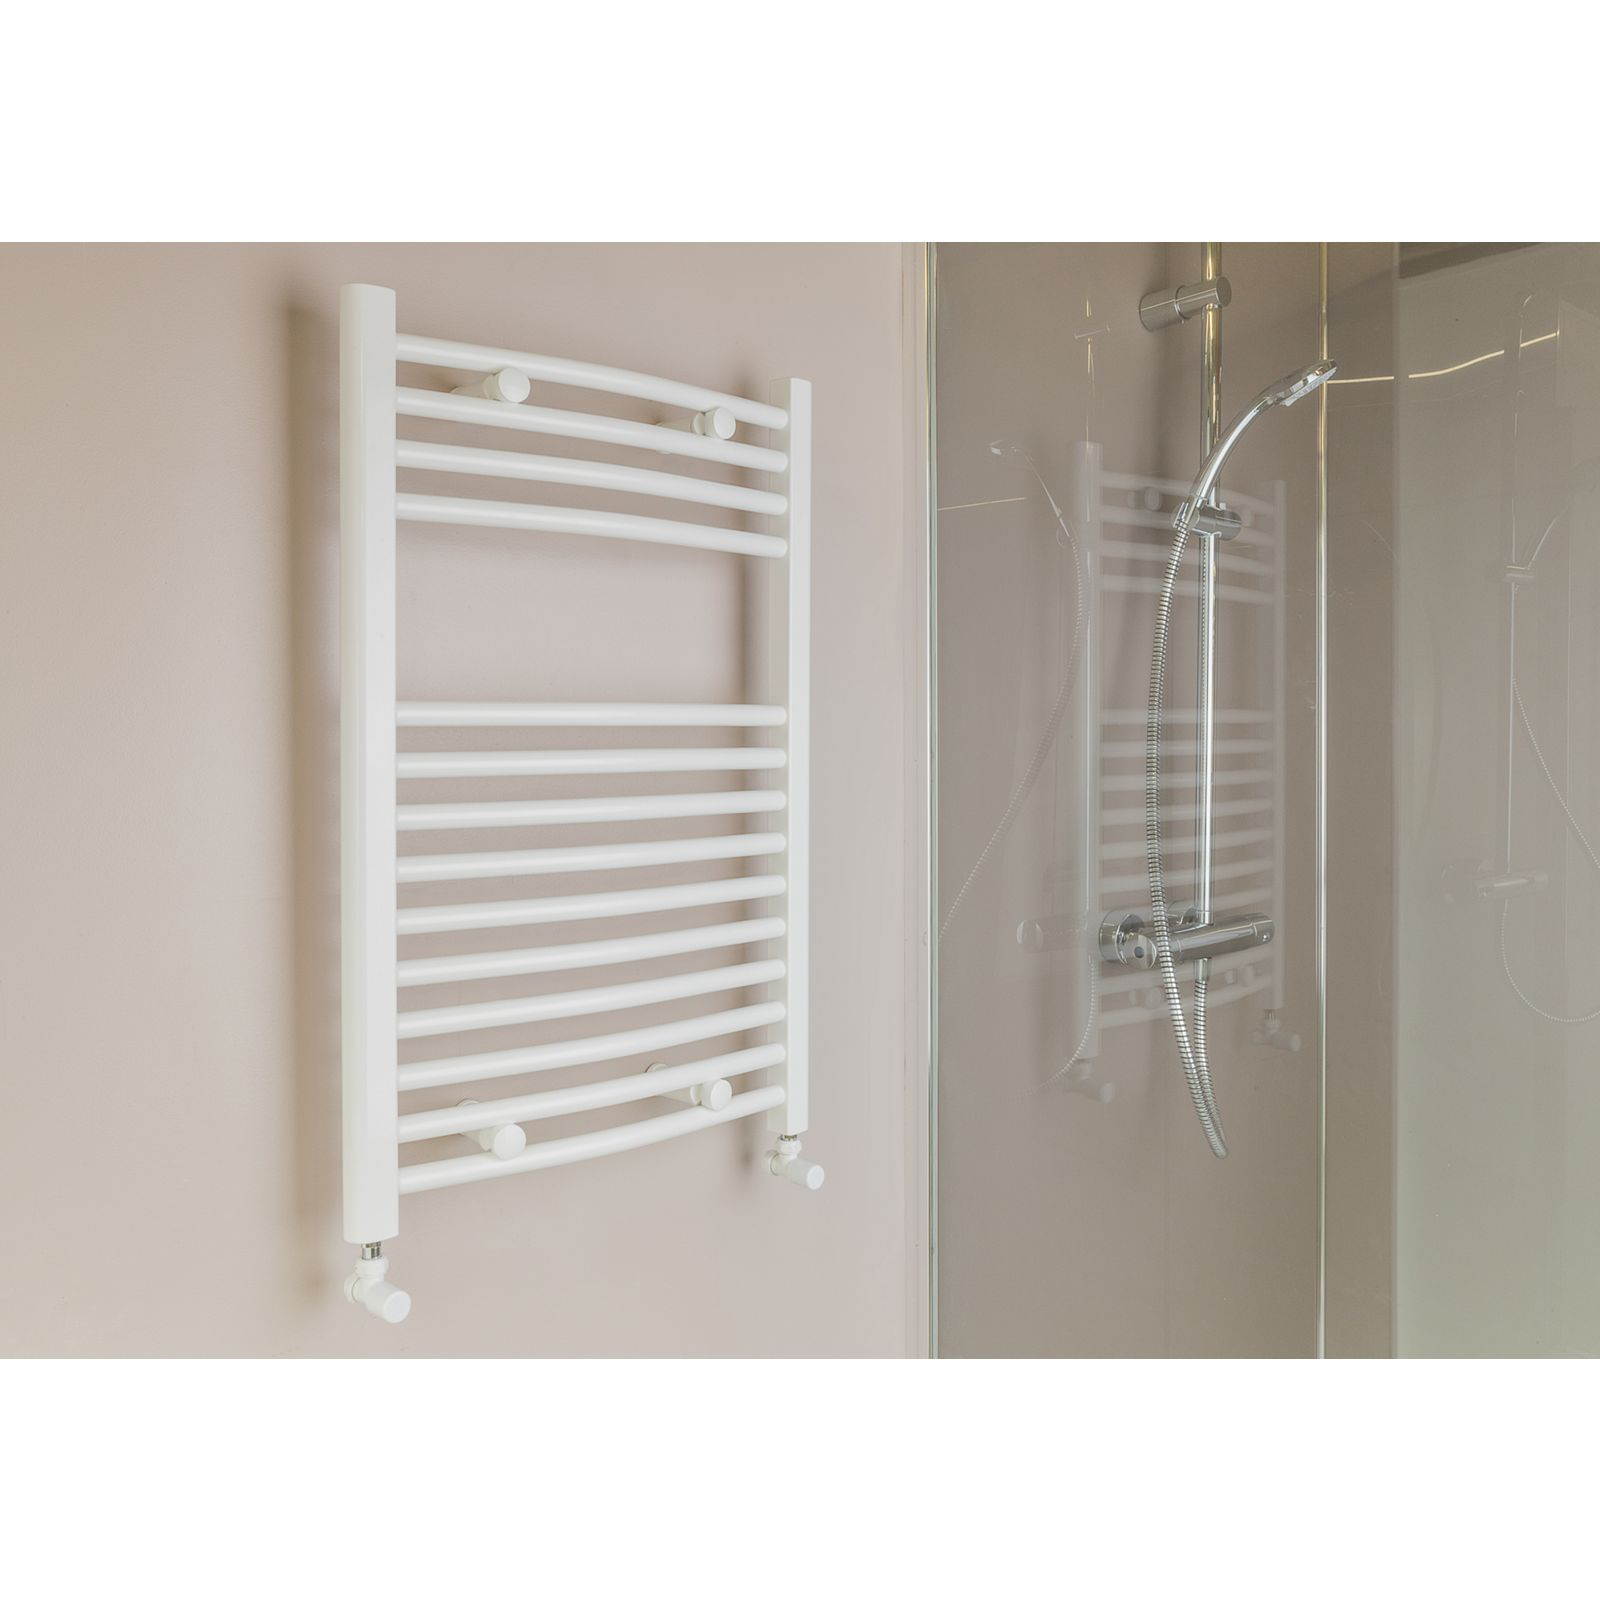 Qual-Rad Heated Towel Rail / Warmer / Radiator – Central Heating 3